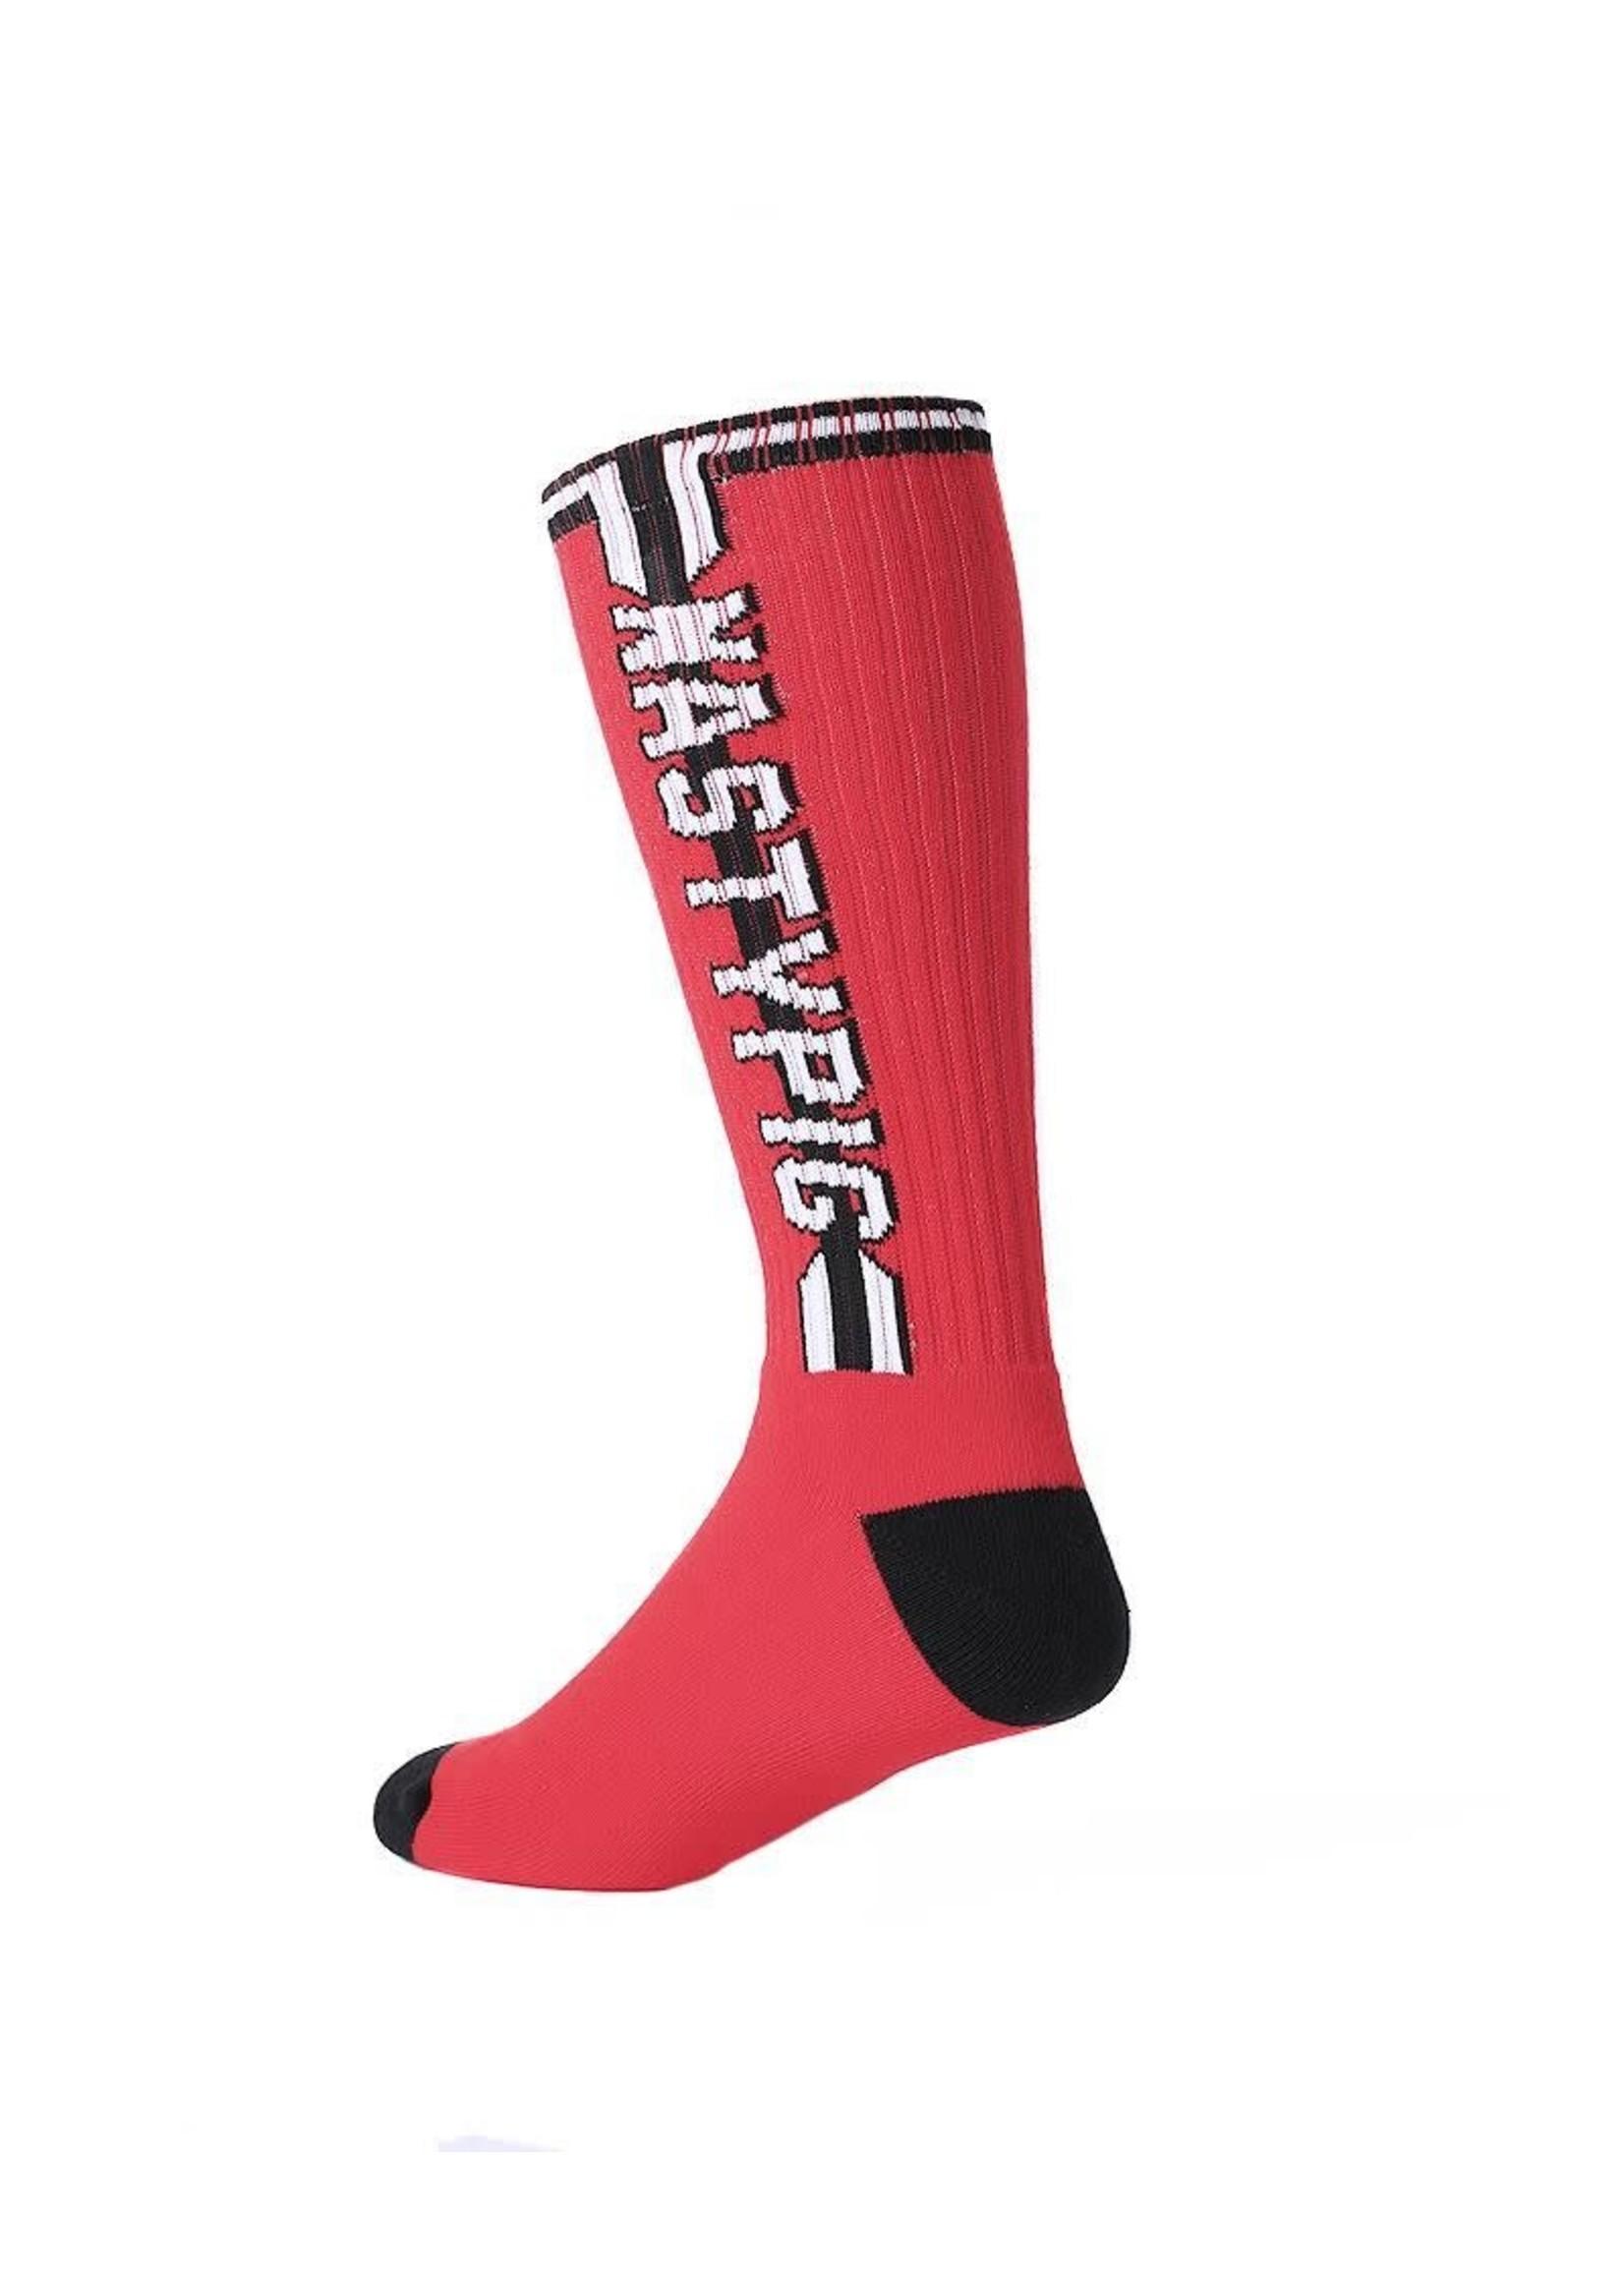 Nasty Pig Nasty Pig Spitfire Socks